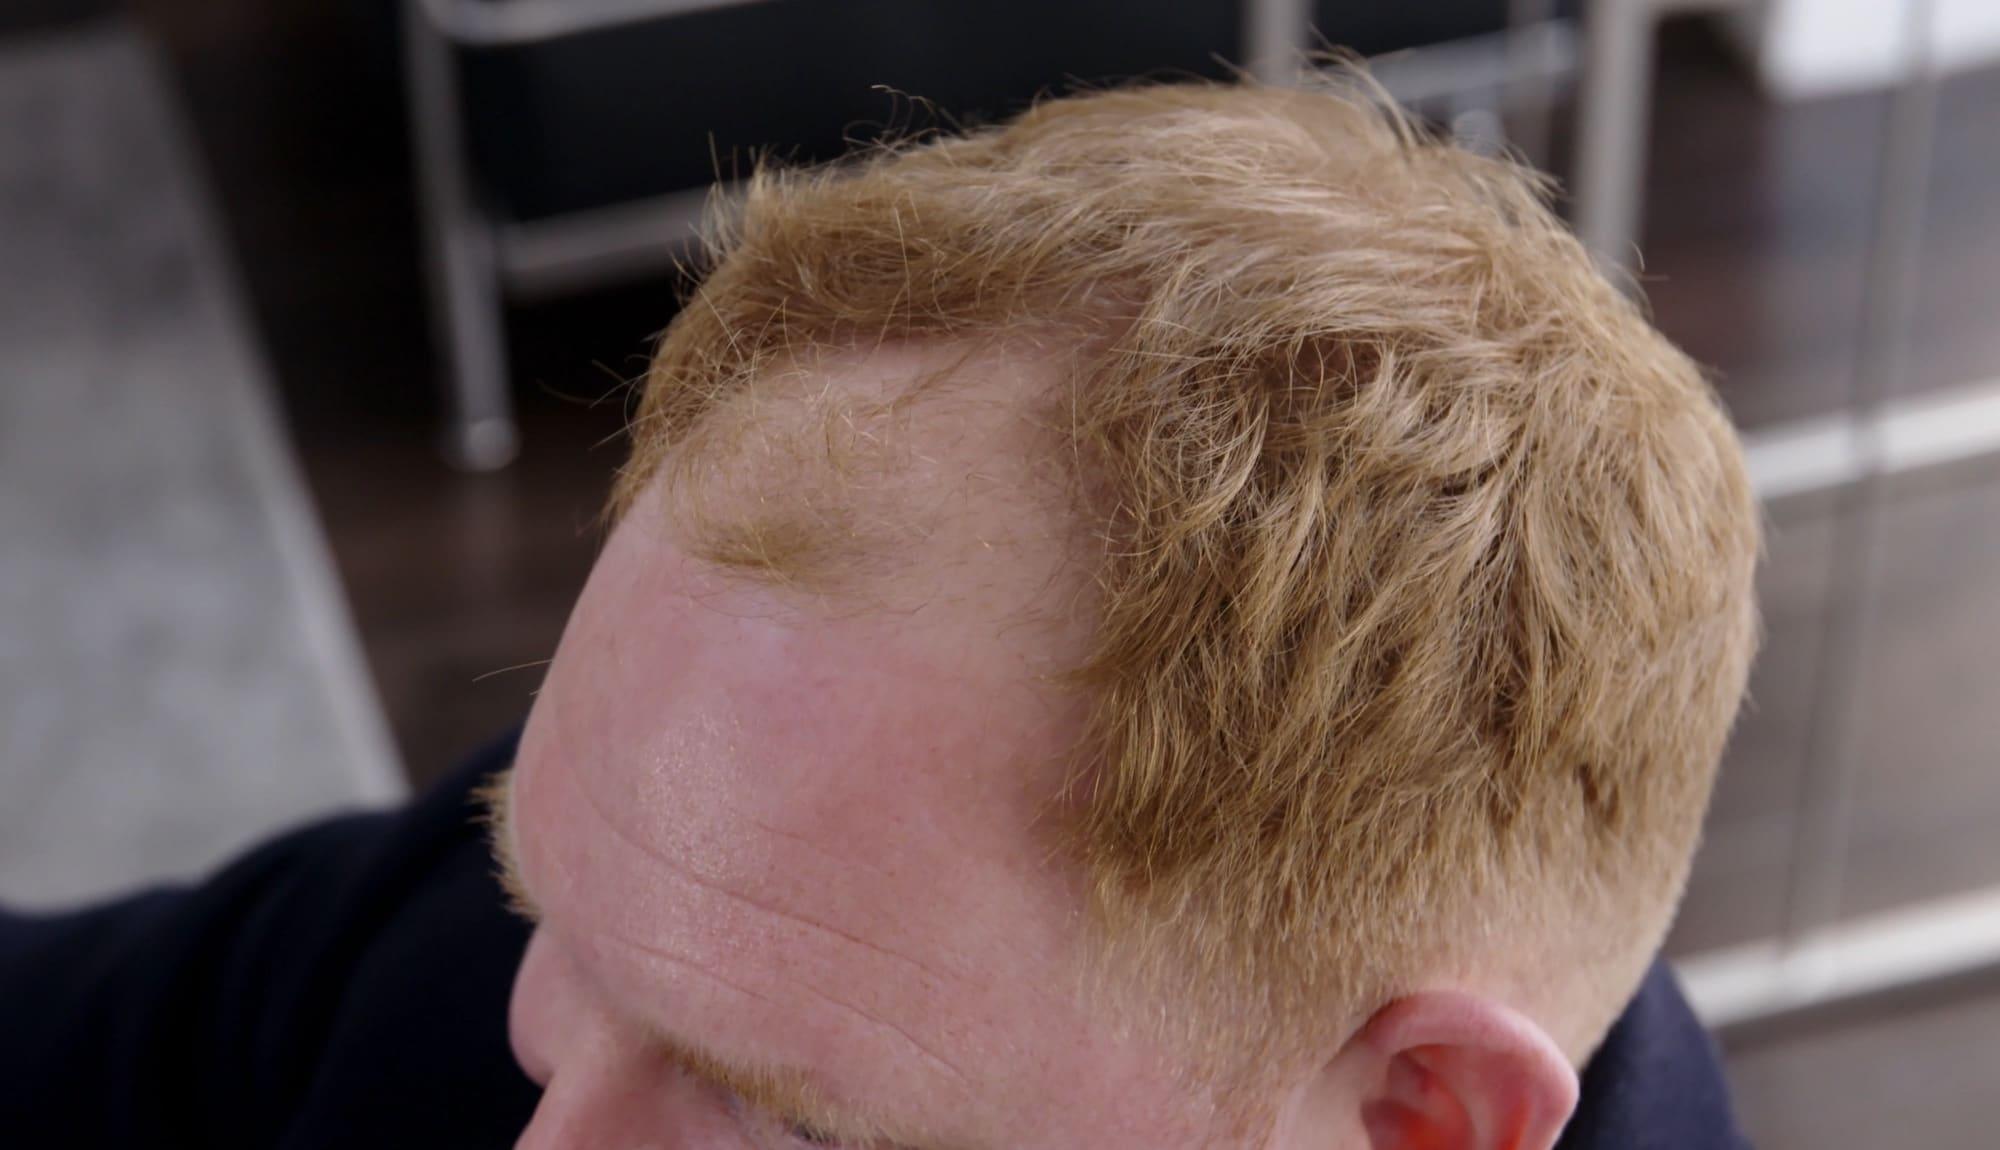 Ben Before Hair Transplant